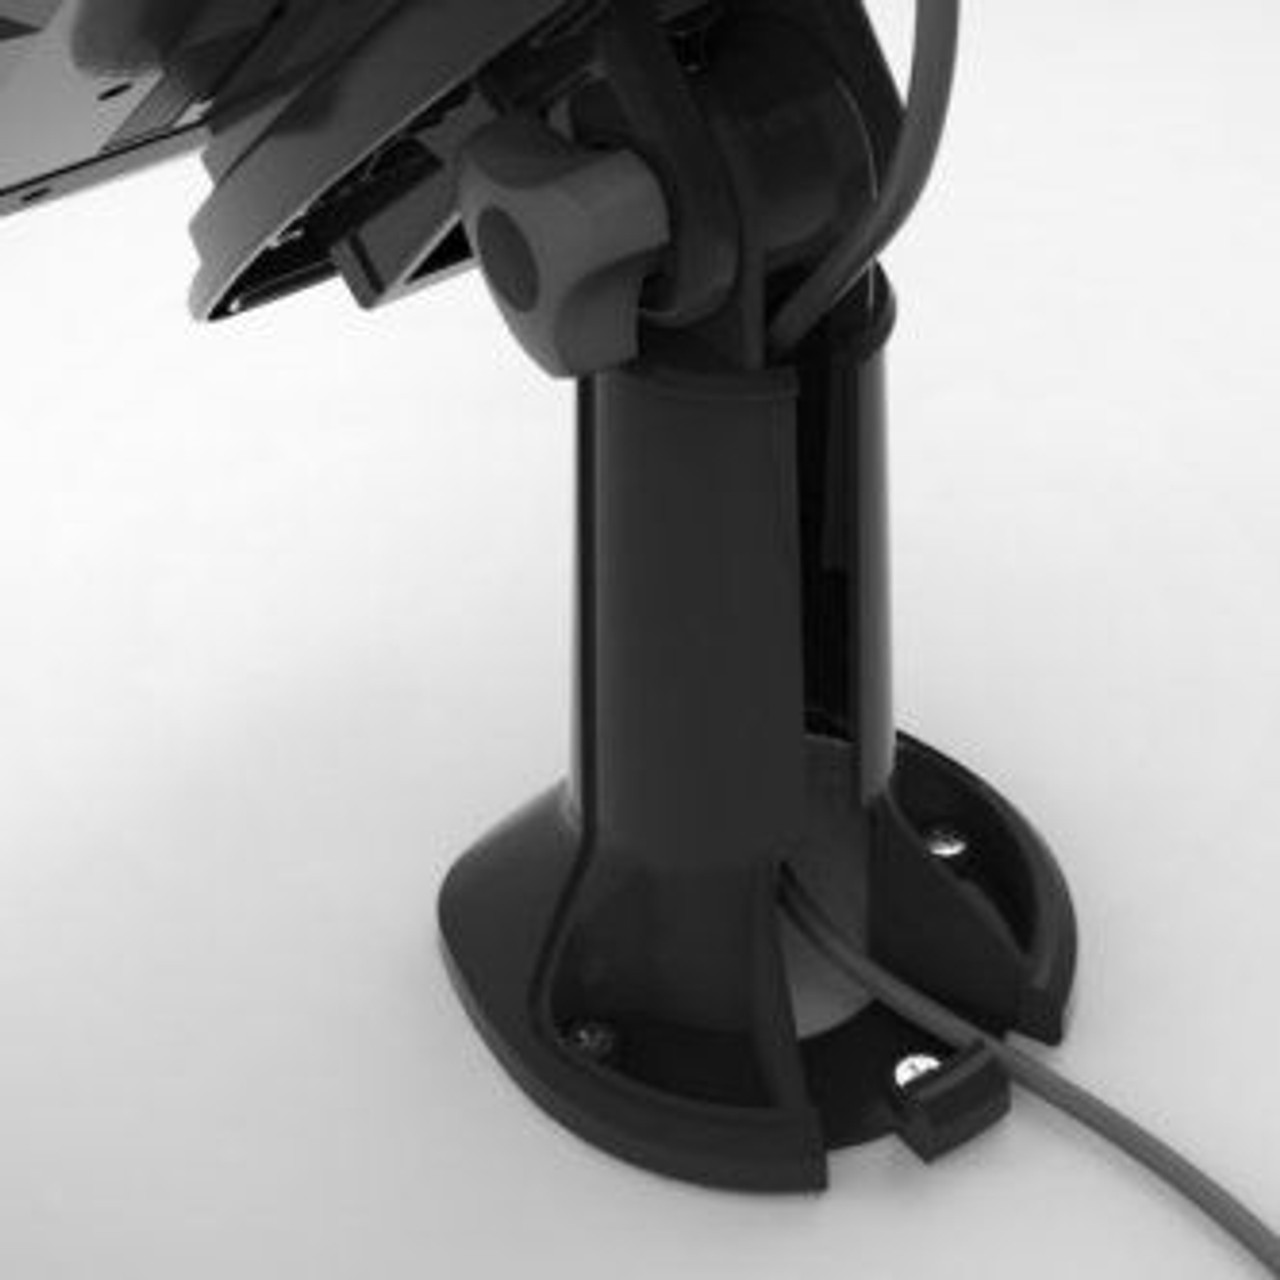 PAX S800 Tailwind FlexiPole Plus Locking Stand